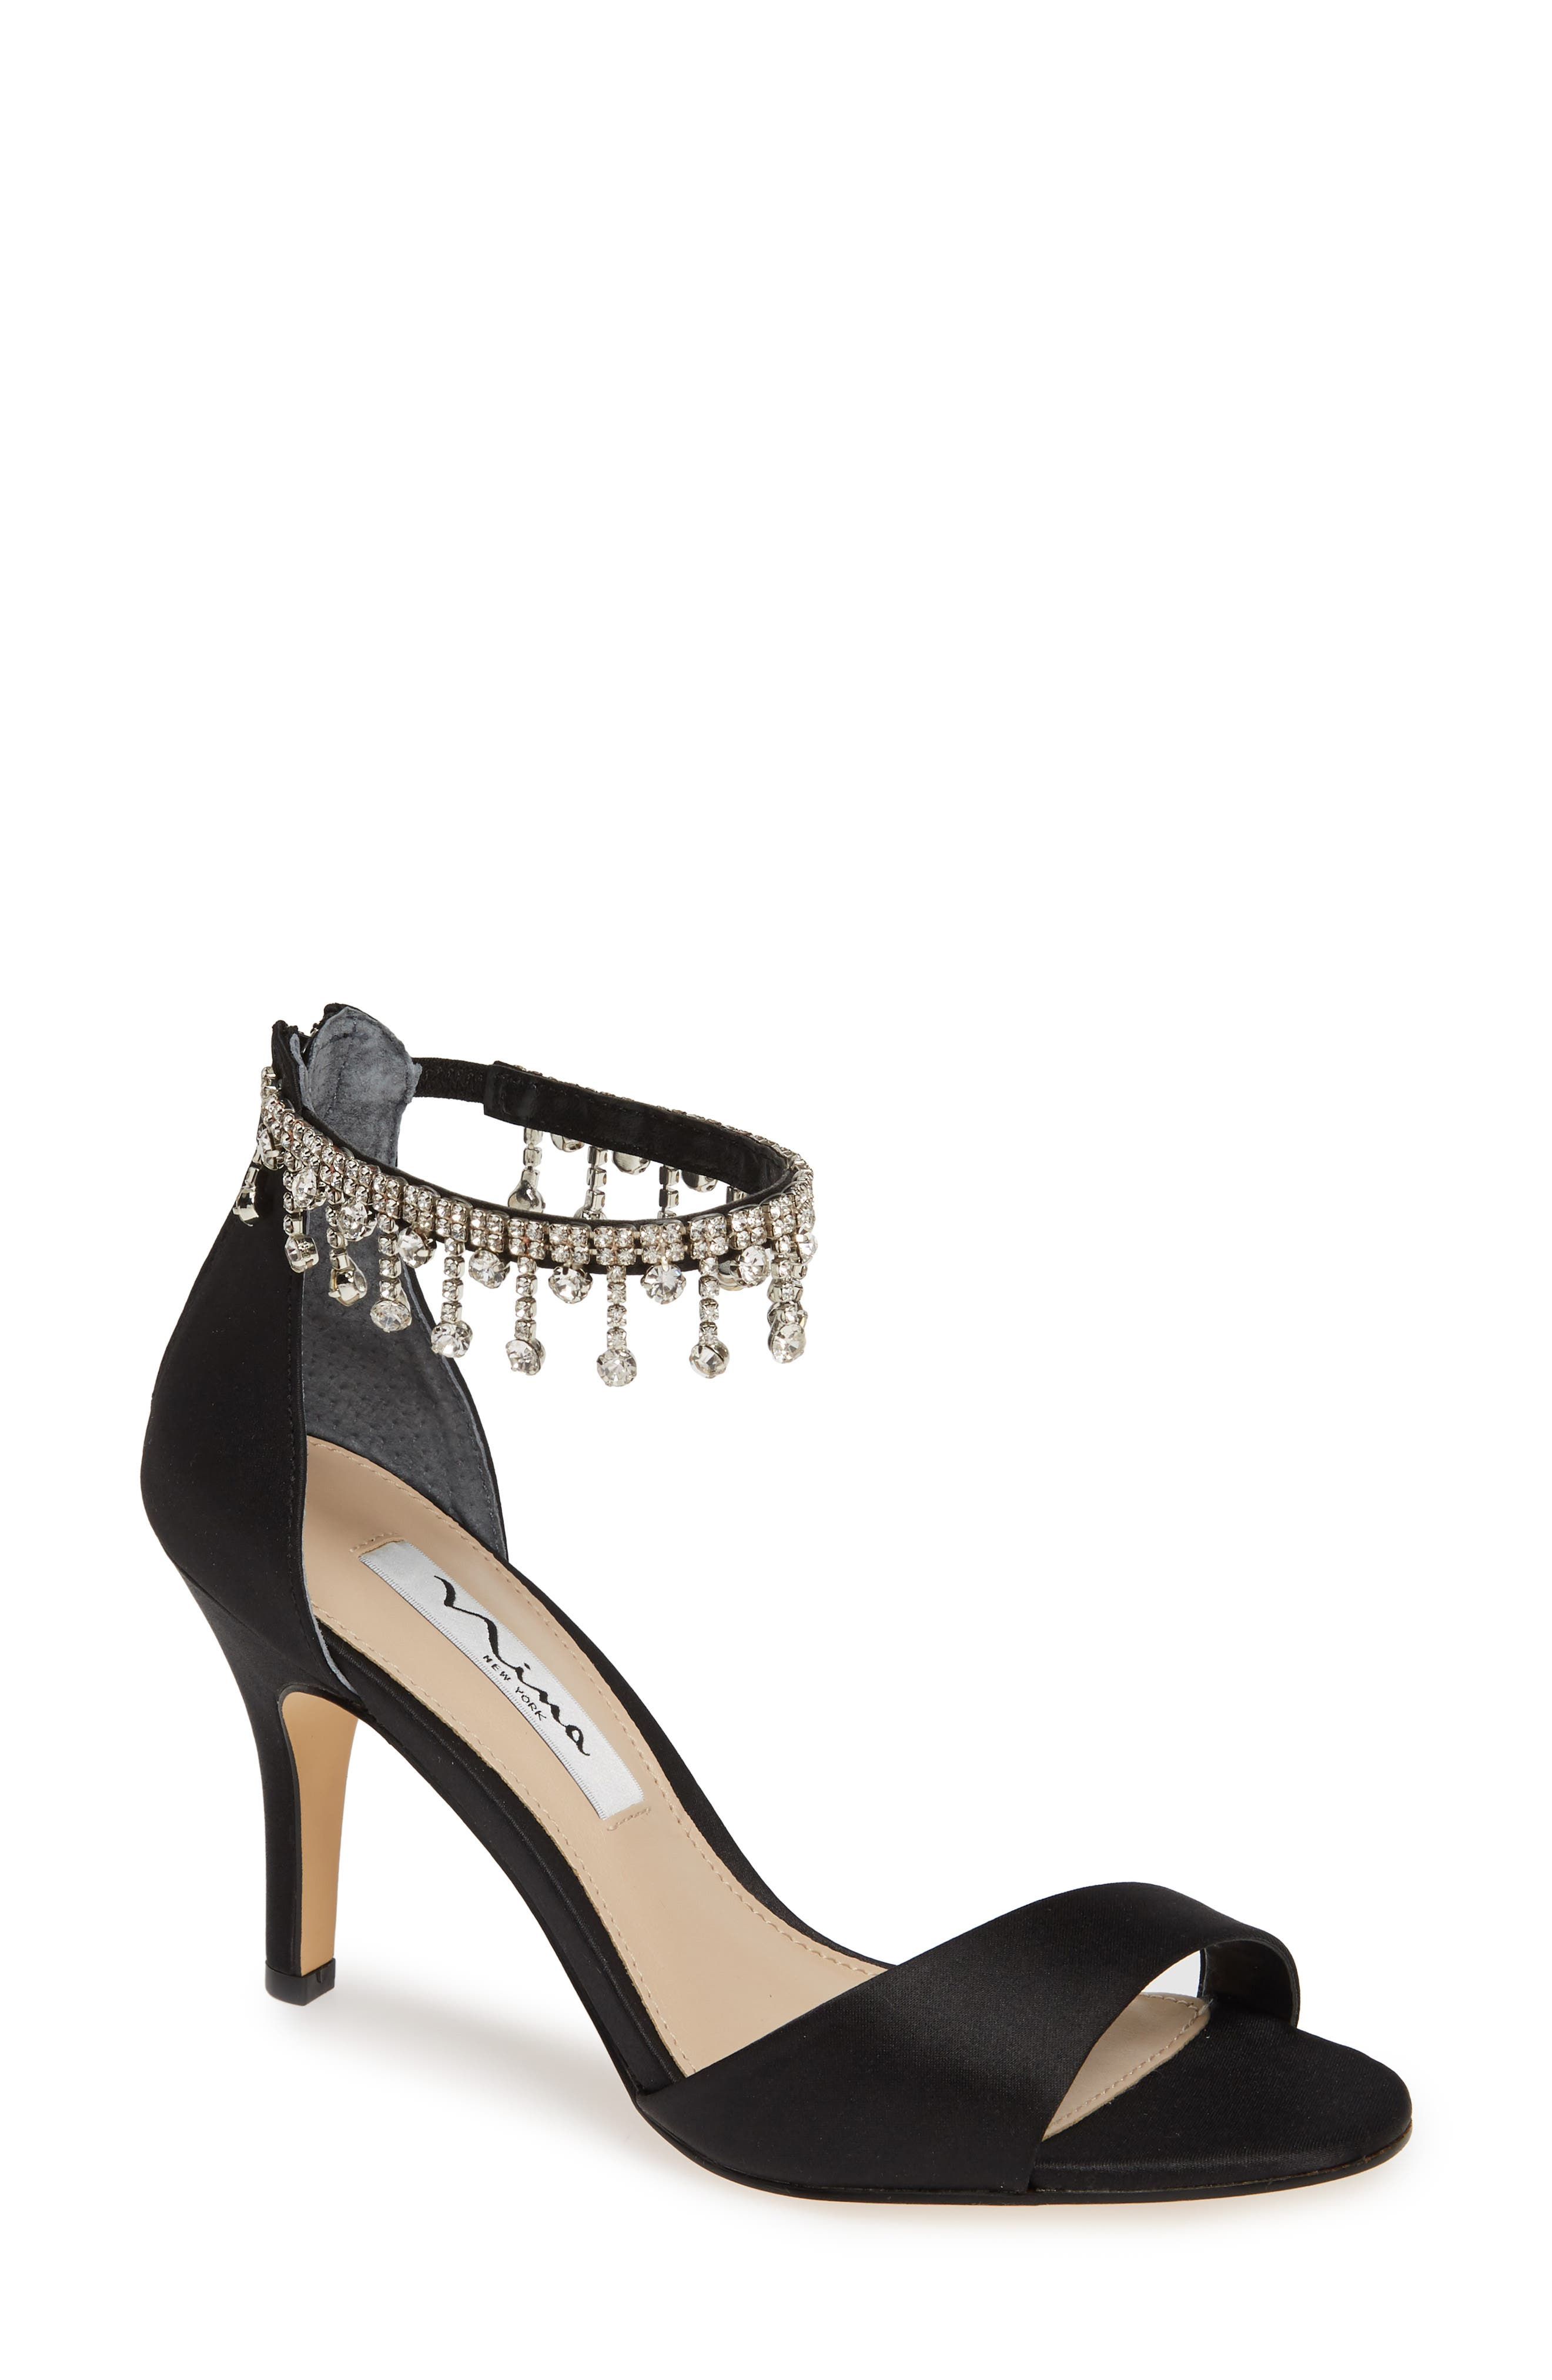 NINA, Vera Embellished Ankle Strap Sandal, Main thumbnail 1, color, BLACK SATIN